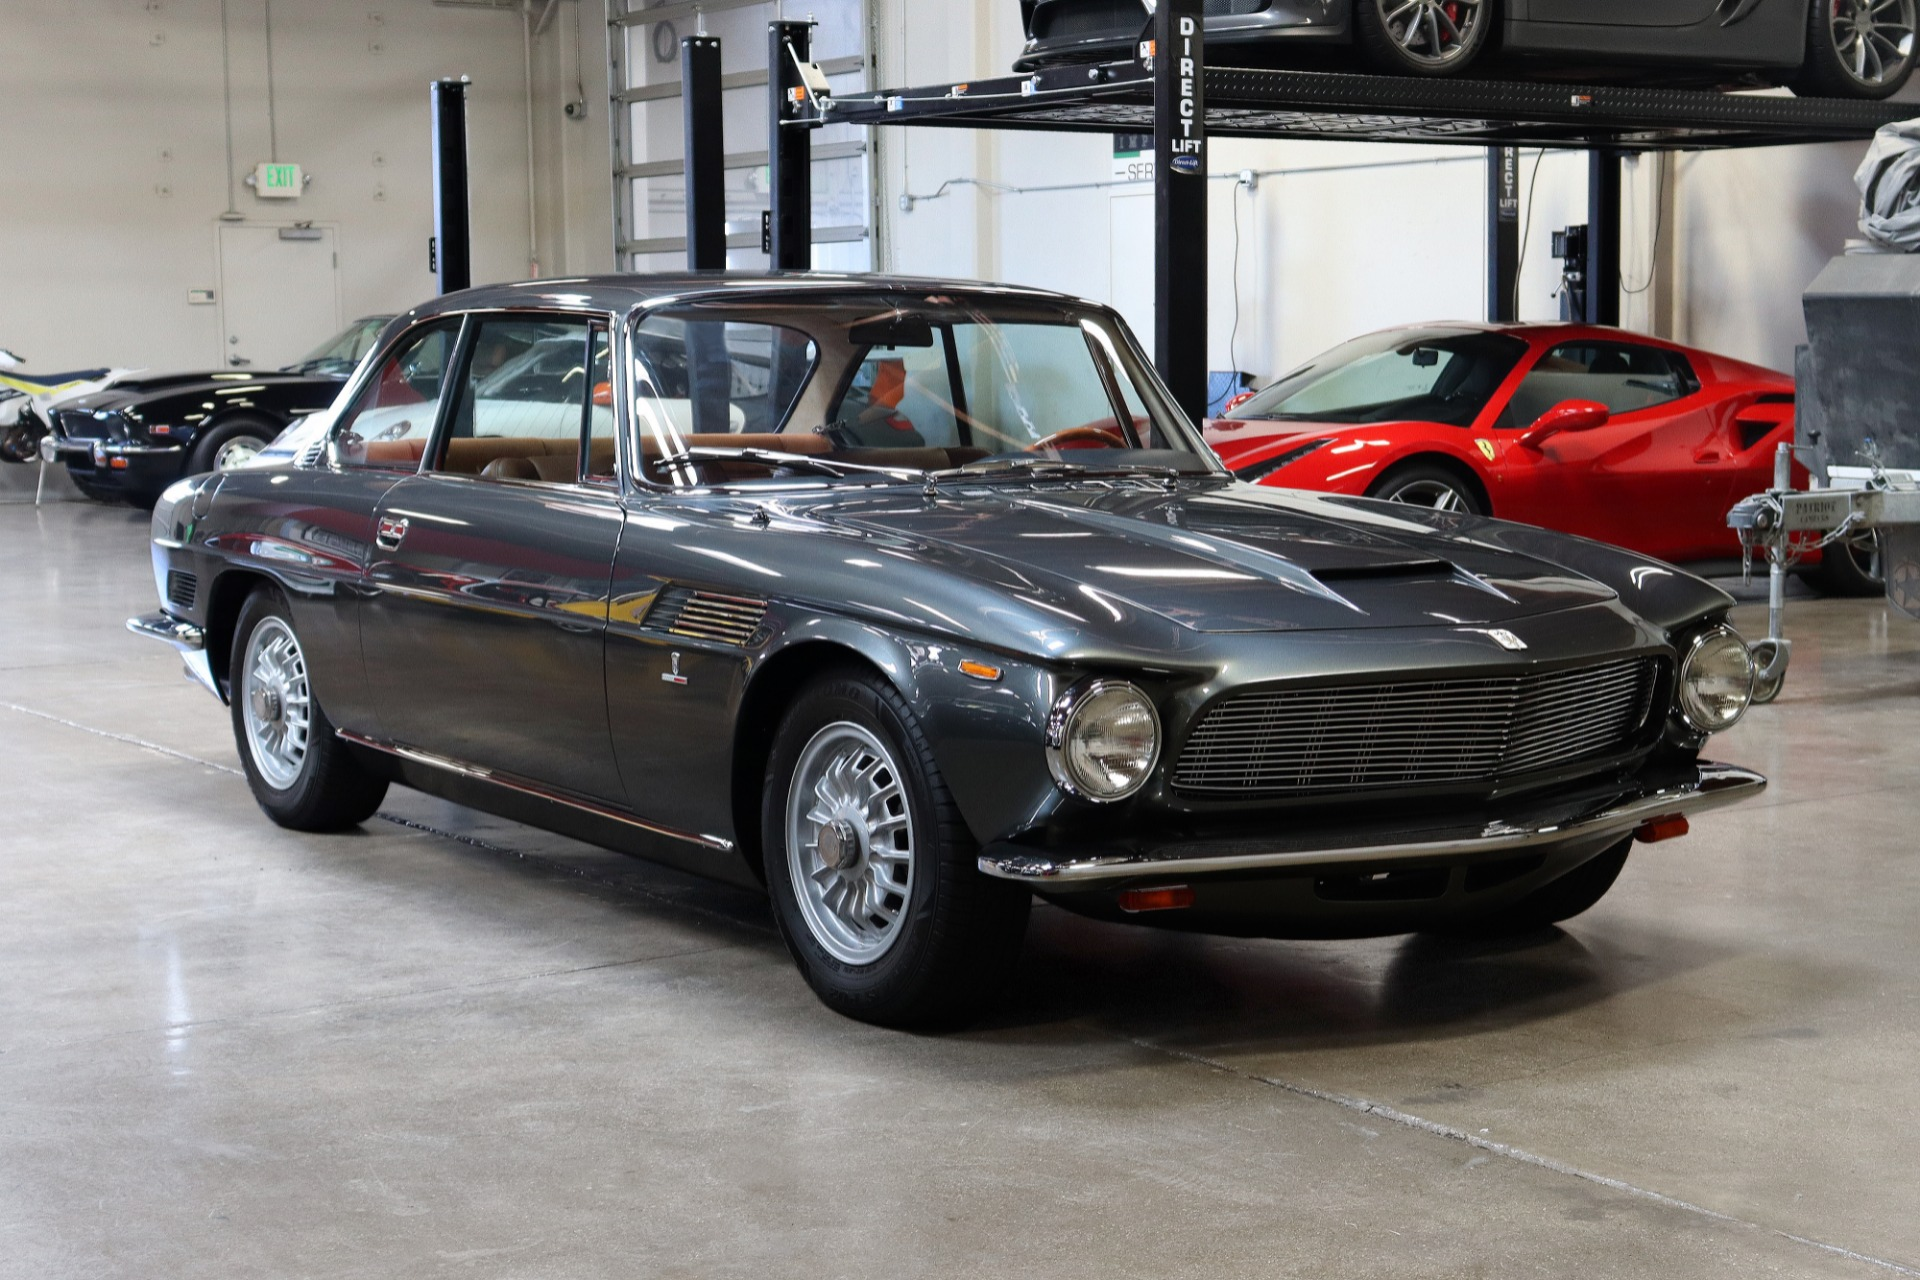 Used 1967 Iso Rivolta for sale $229,995 at San Francisco Sports Cars in San Carlos CA 94070 1